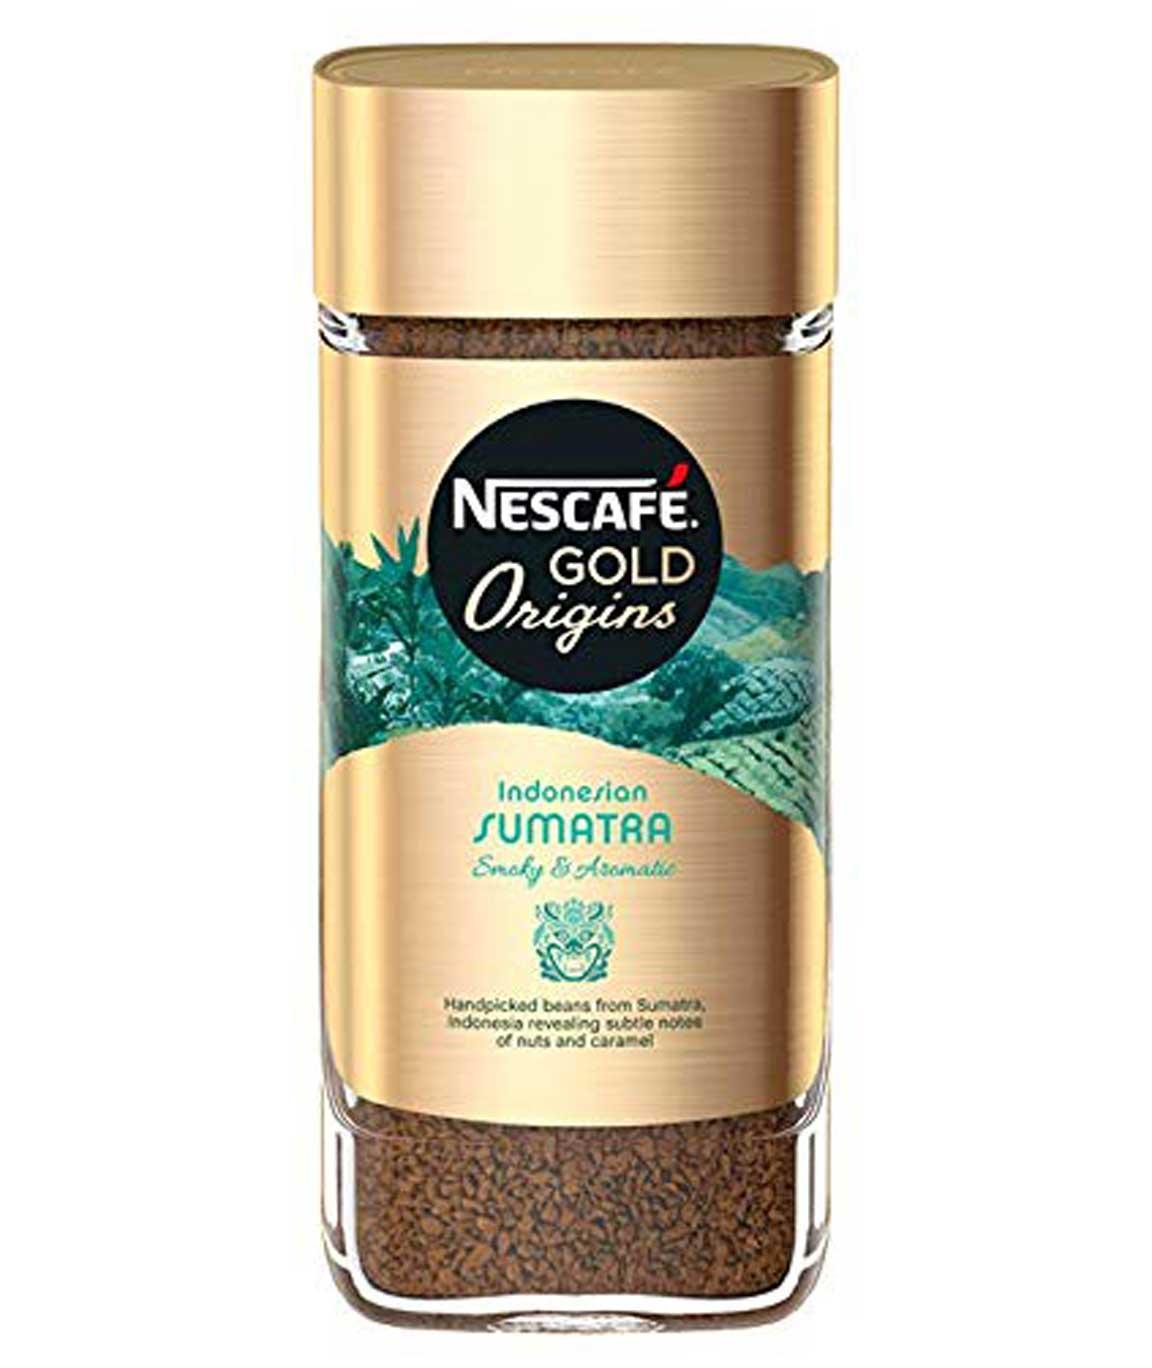 Nescafe Gold Origins Indonesian Sumatra Coffee Bottle, 100g